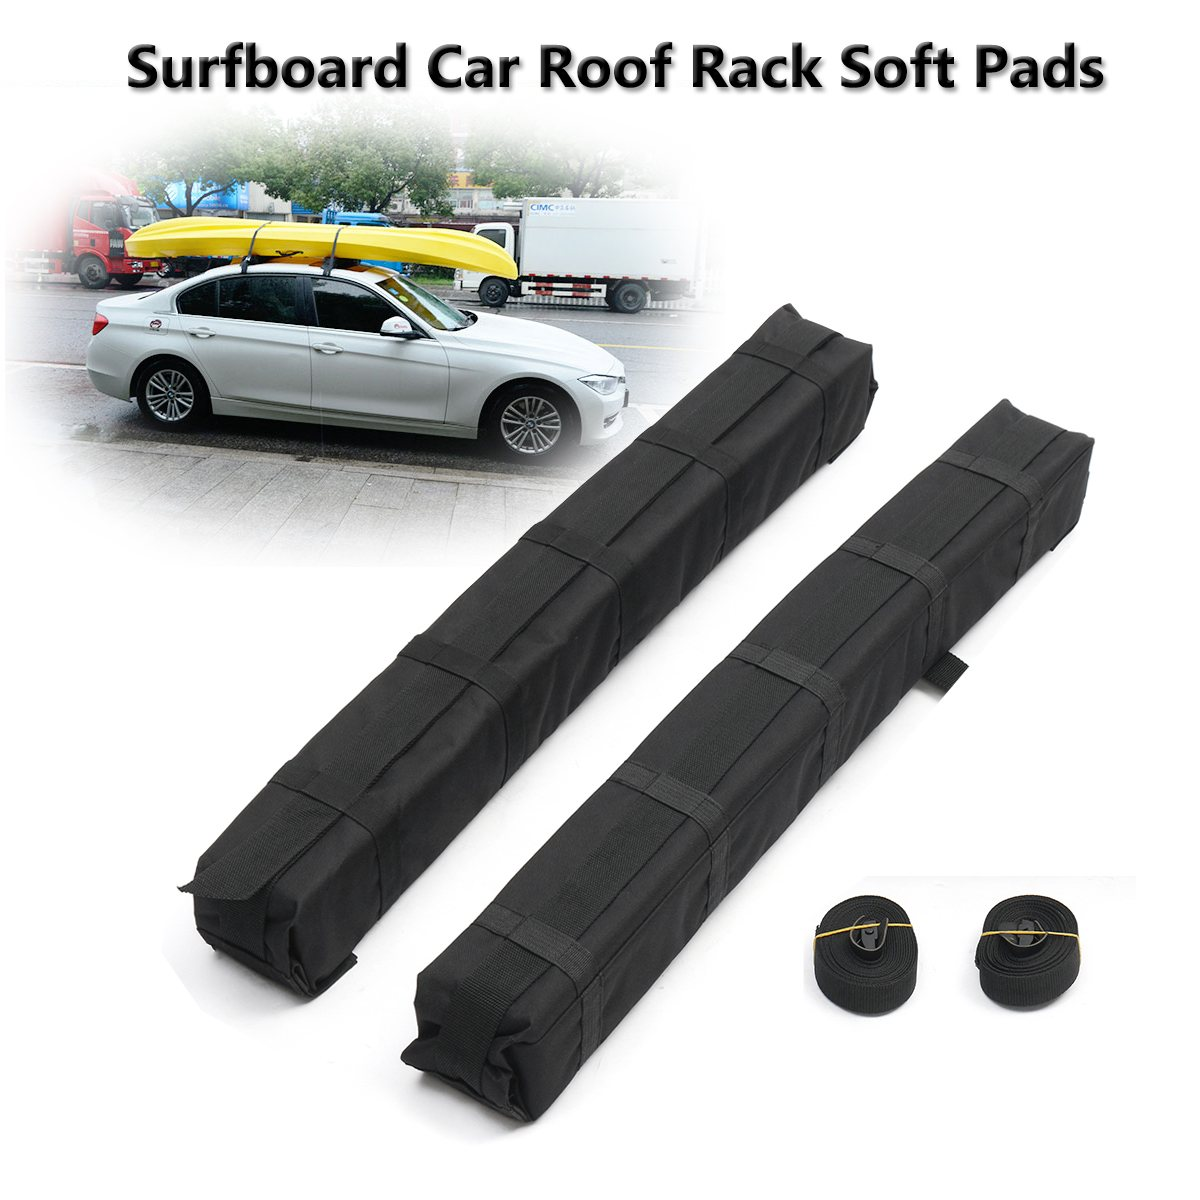 2 uds unids. Universal Auto Soft Car Roof Rack Cross Bar Kayaks Surfboard Car Roof Rack EVA Soft Pads Outdoor Travel equipaje Carrier Bar